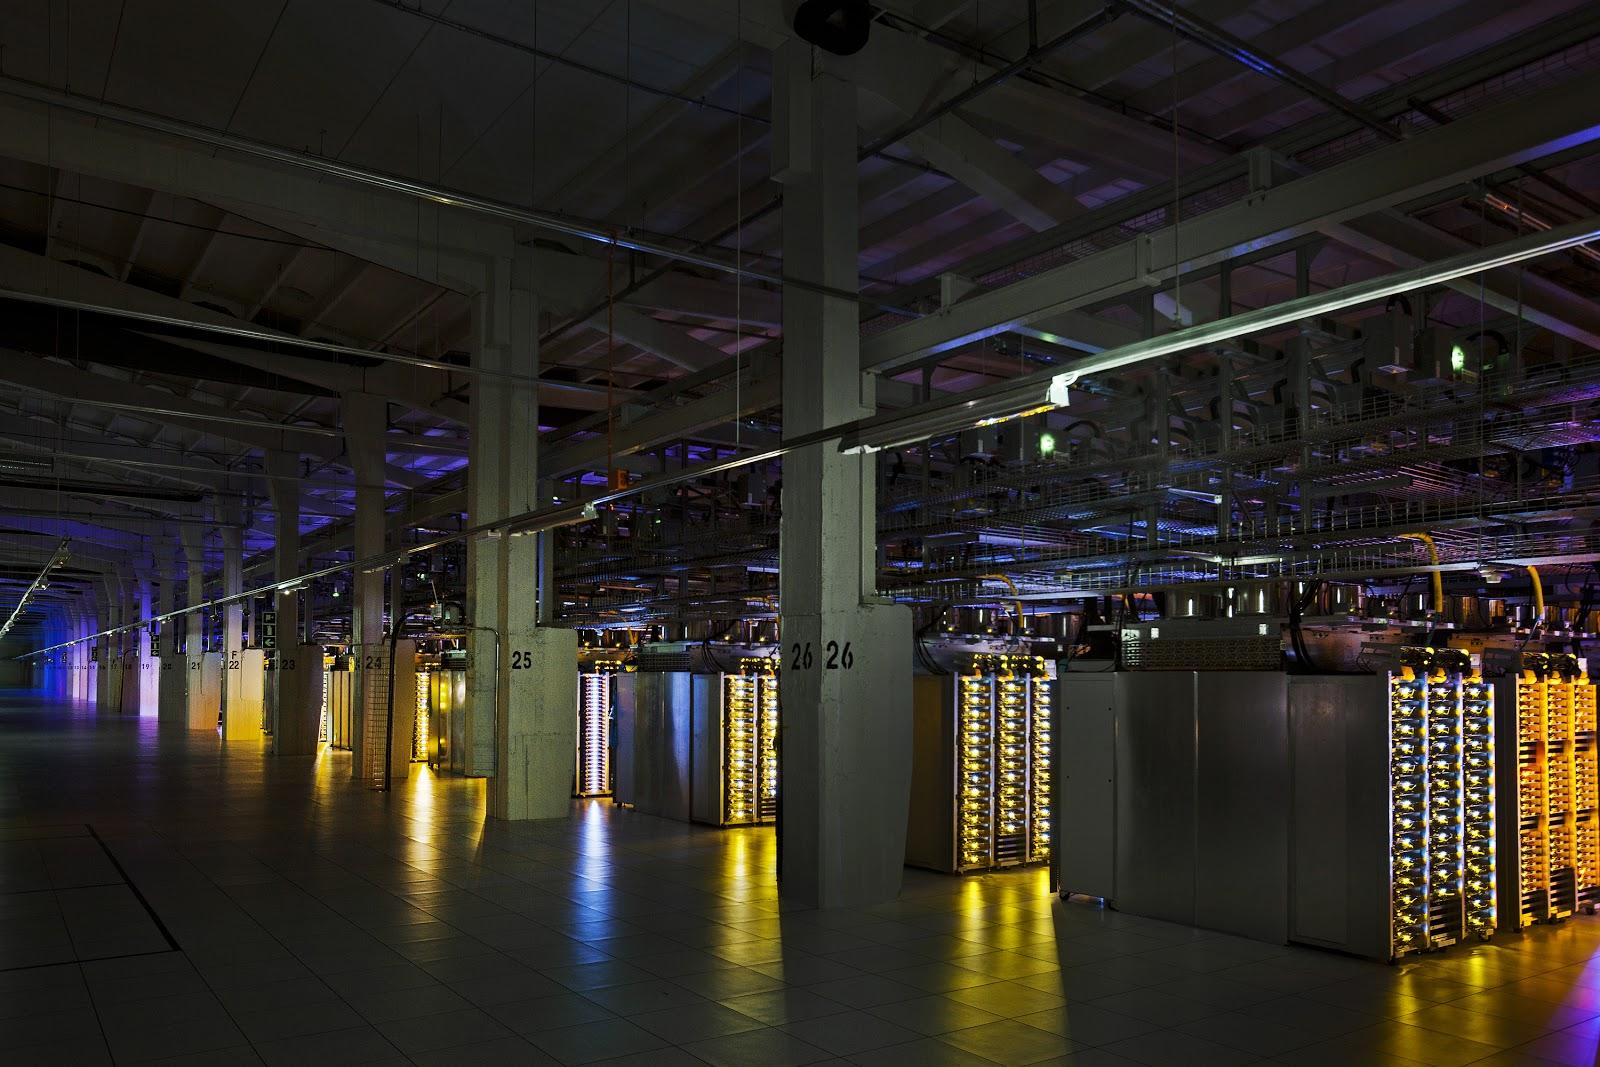 Server Farm - سرور فارم - مزرعه سرور